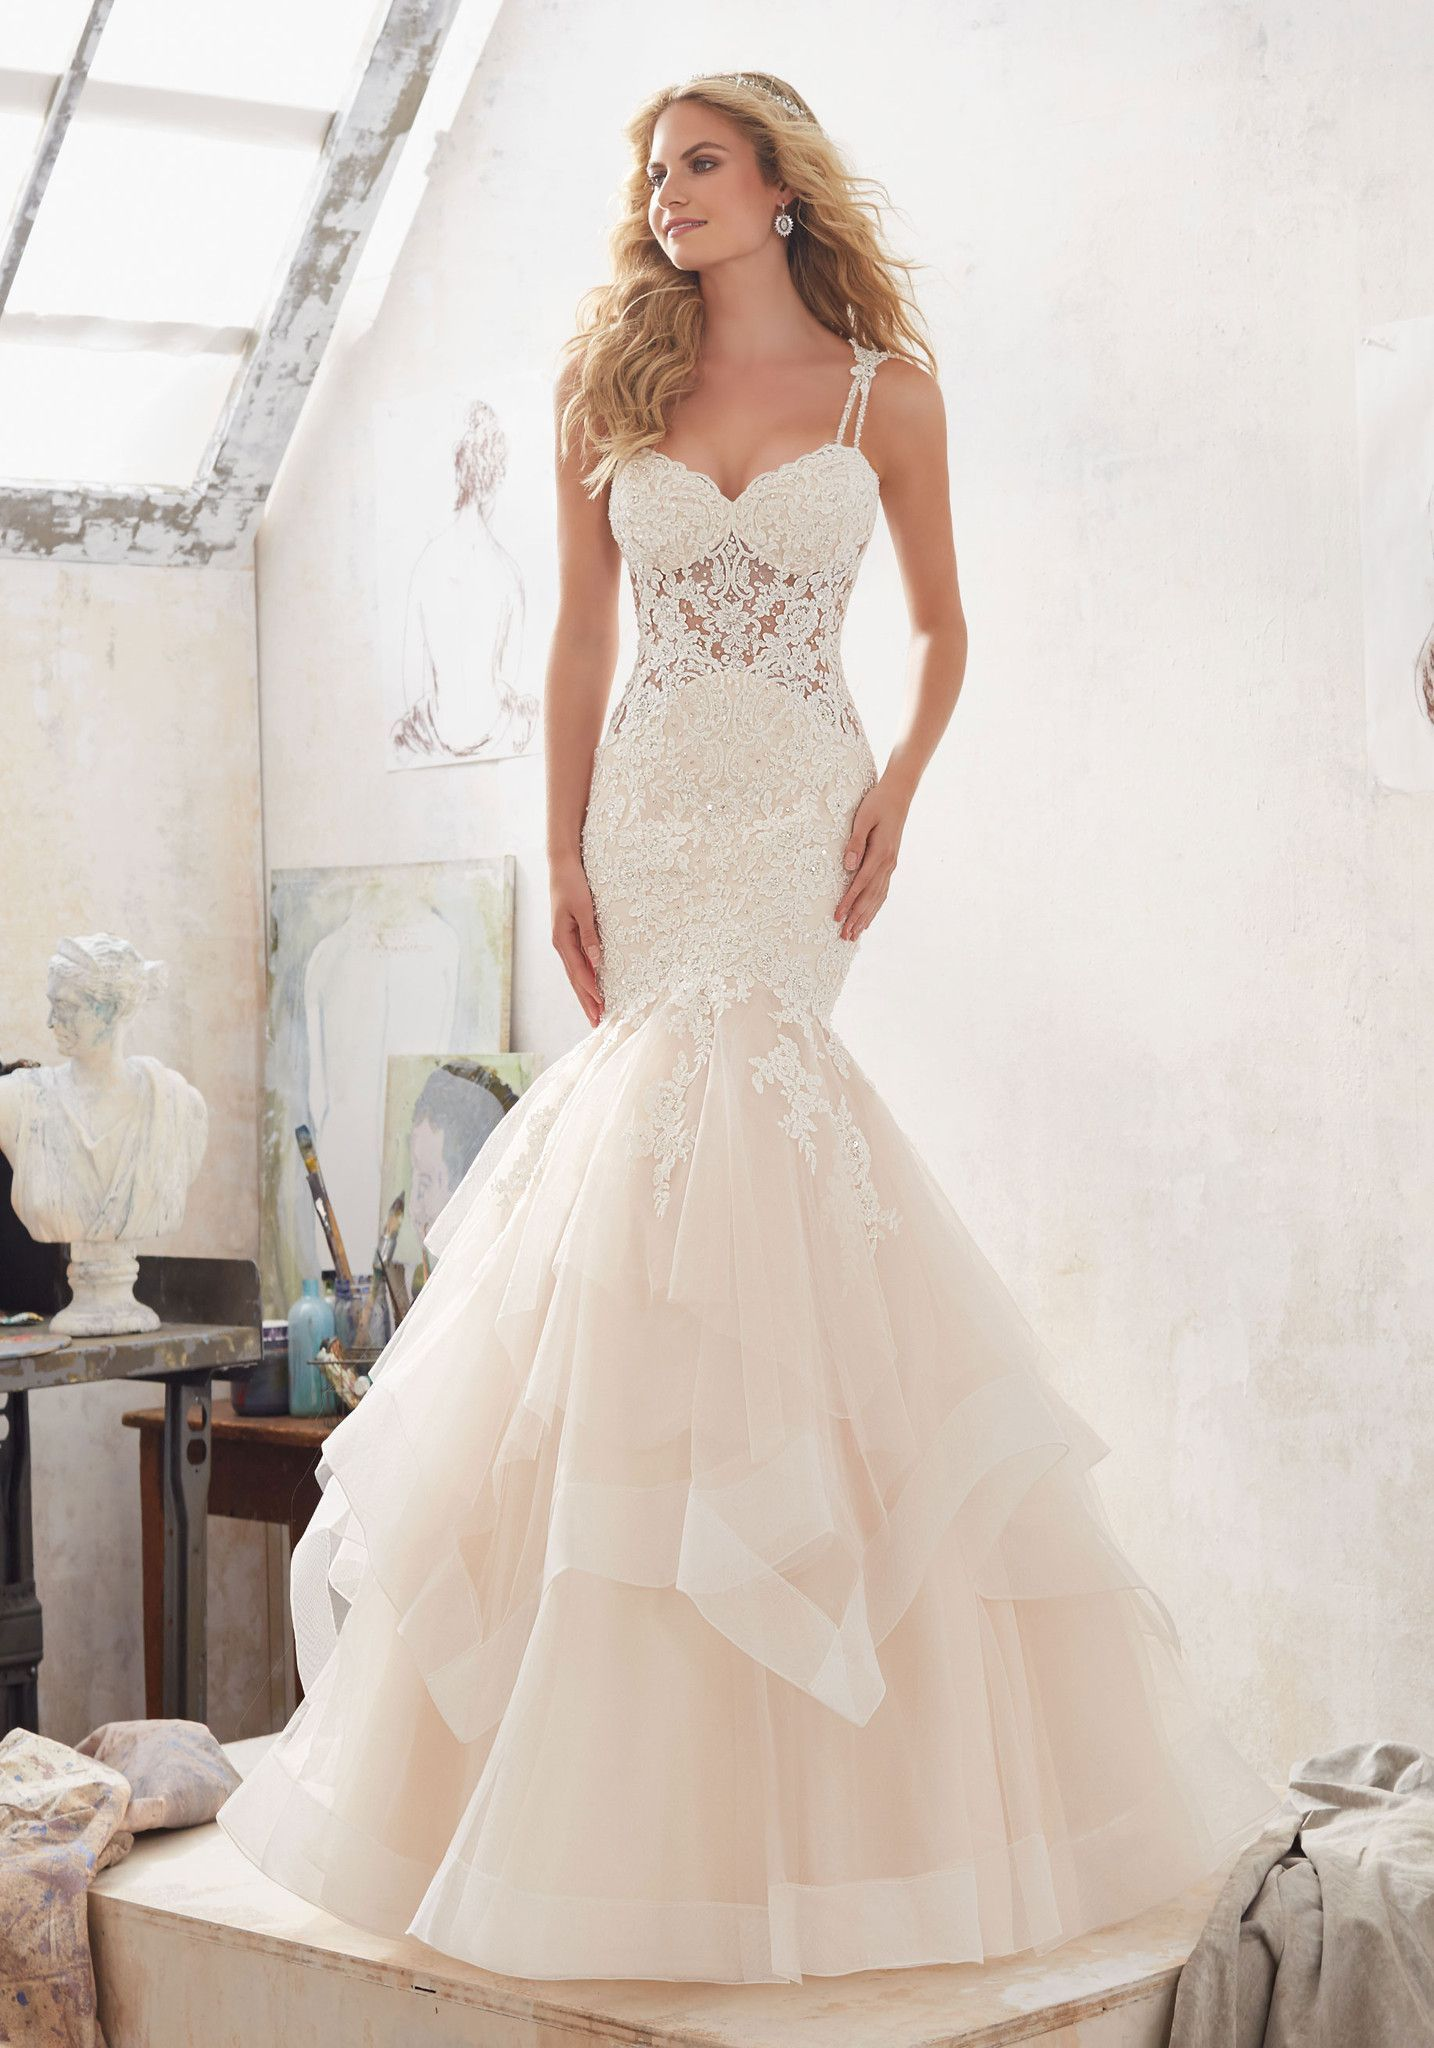 Mori Lee - Marciela - 8118 - All Dressed Up, Bridal Gown ...